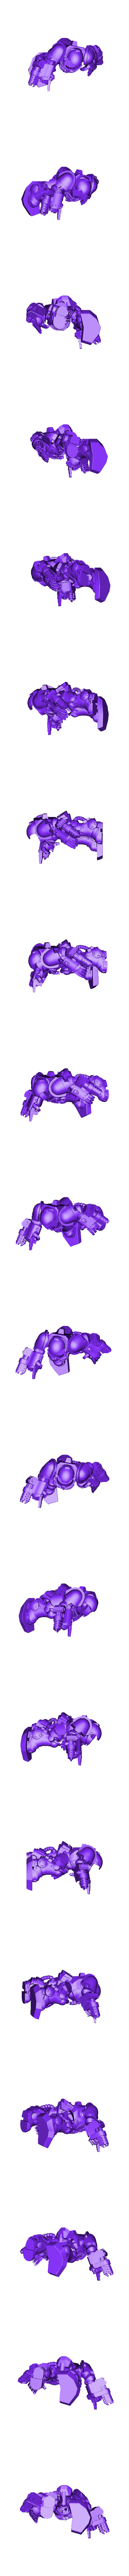 Sgt_2_Body.stl Download free STL file Flame Armed Instigators • 3D printable template, danny_cyanide